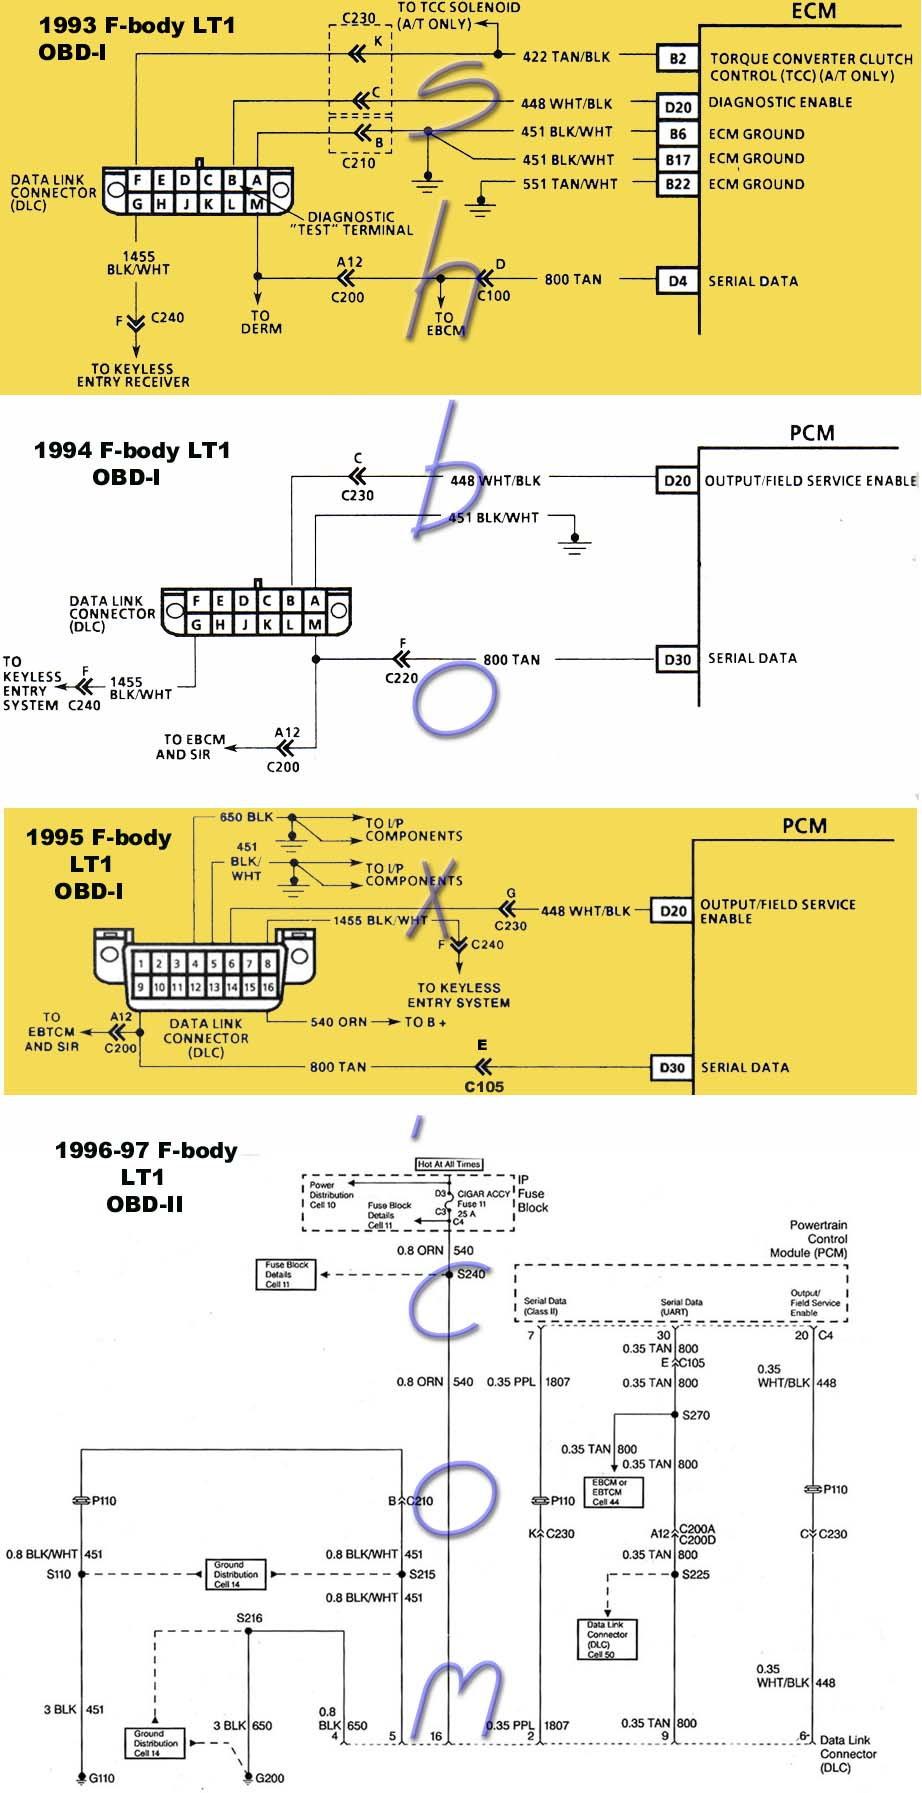 medium resolution of lt1 only runs on starter fluid ls1tech camaro and firebird camaro obd1 data link connectors dlc camaro diagrams pinterest